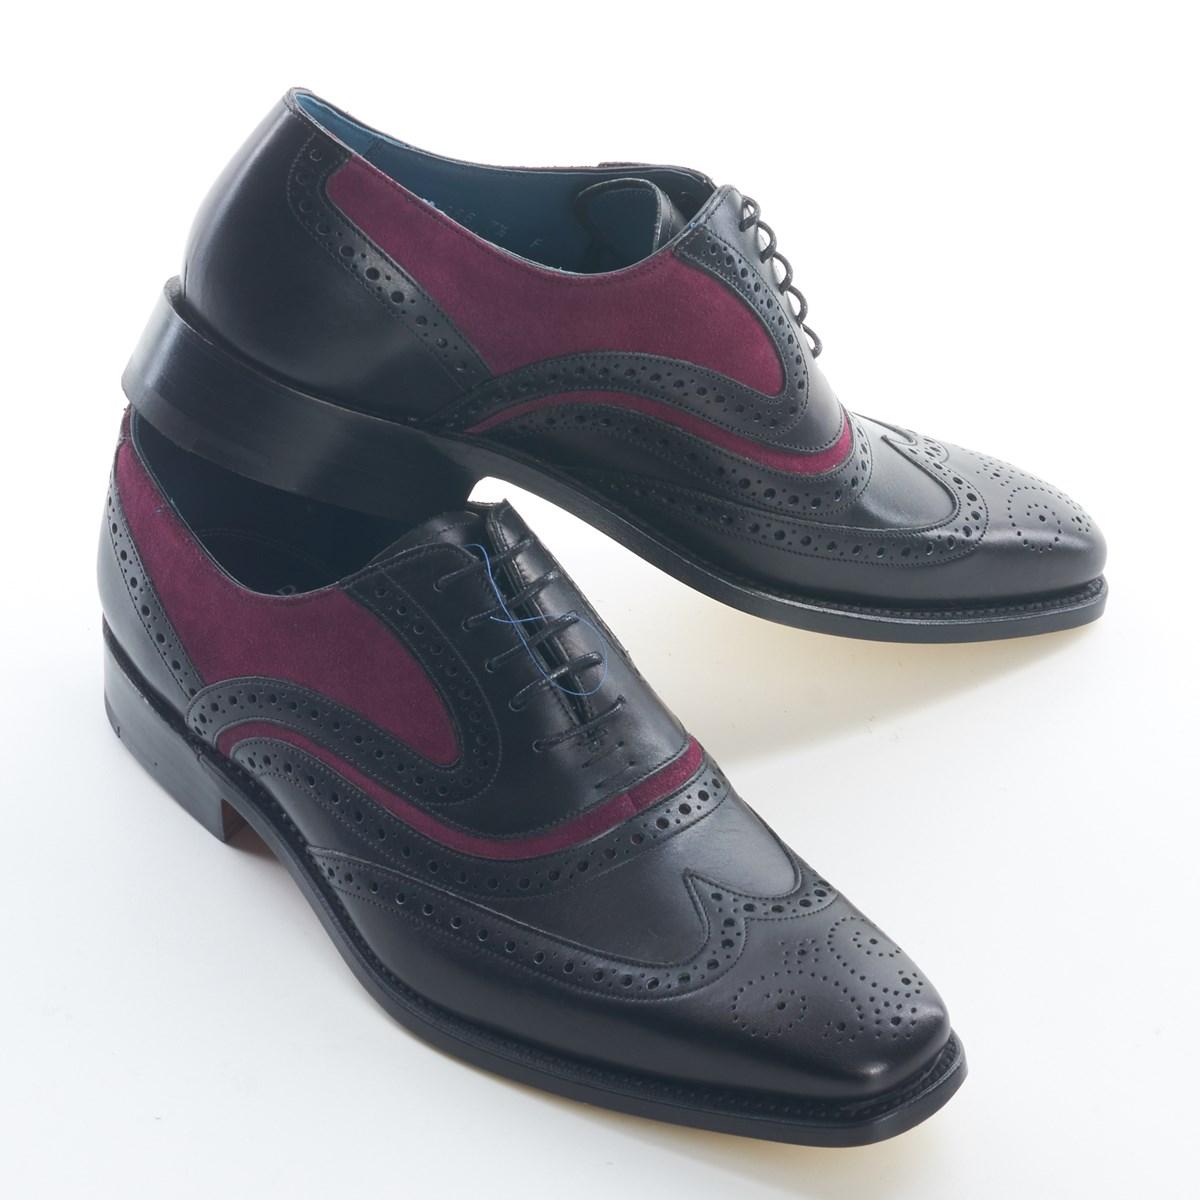 0f58fbd5f075b Dress Brogue Wingtip McClean Black Calf and Purple Suede by Barker ·  1203053_barker_shoe_mcclean_bcps_3074_3132 ·  1203053_barker_shoe_mcclean_bcps_3076_3134